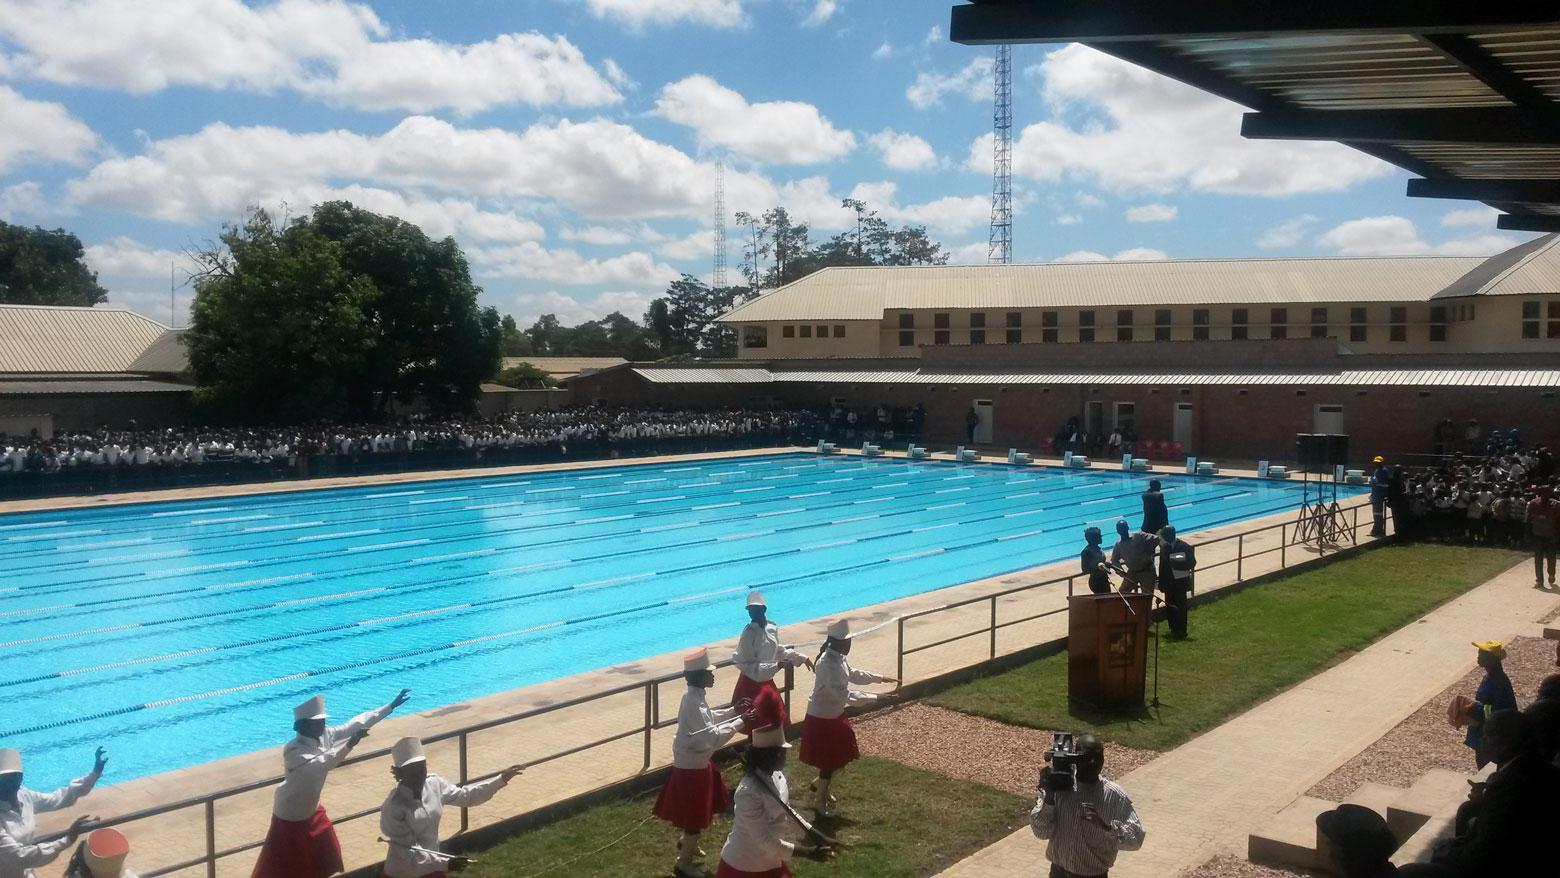 Piscine olympique du Lycée Kiwele à Lubumbashi